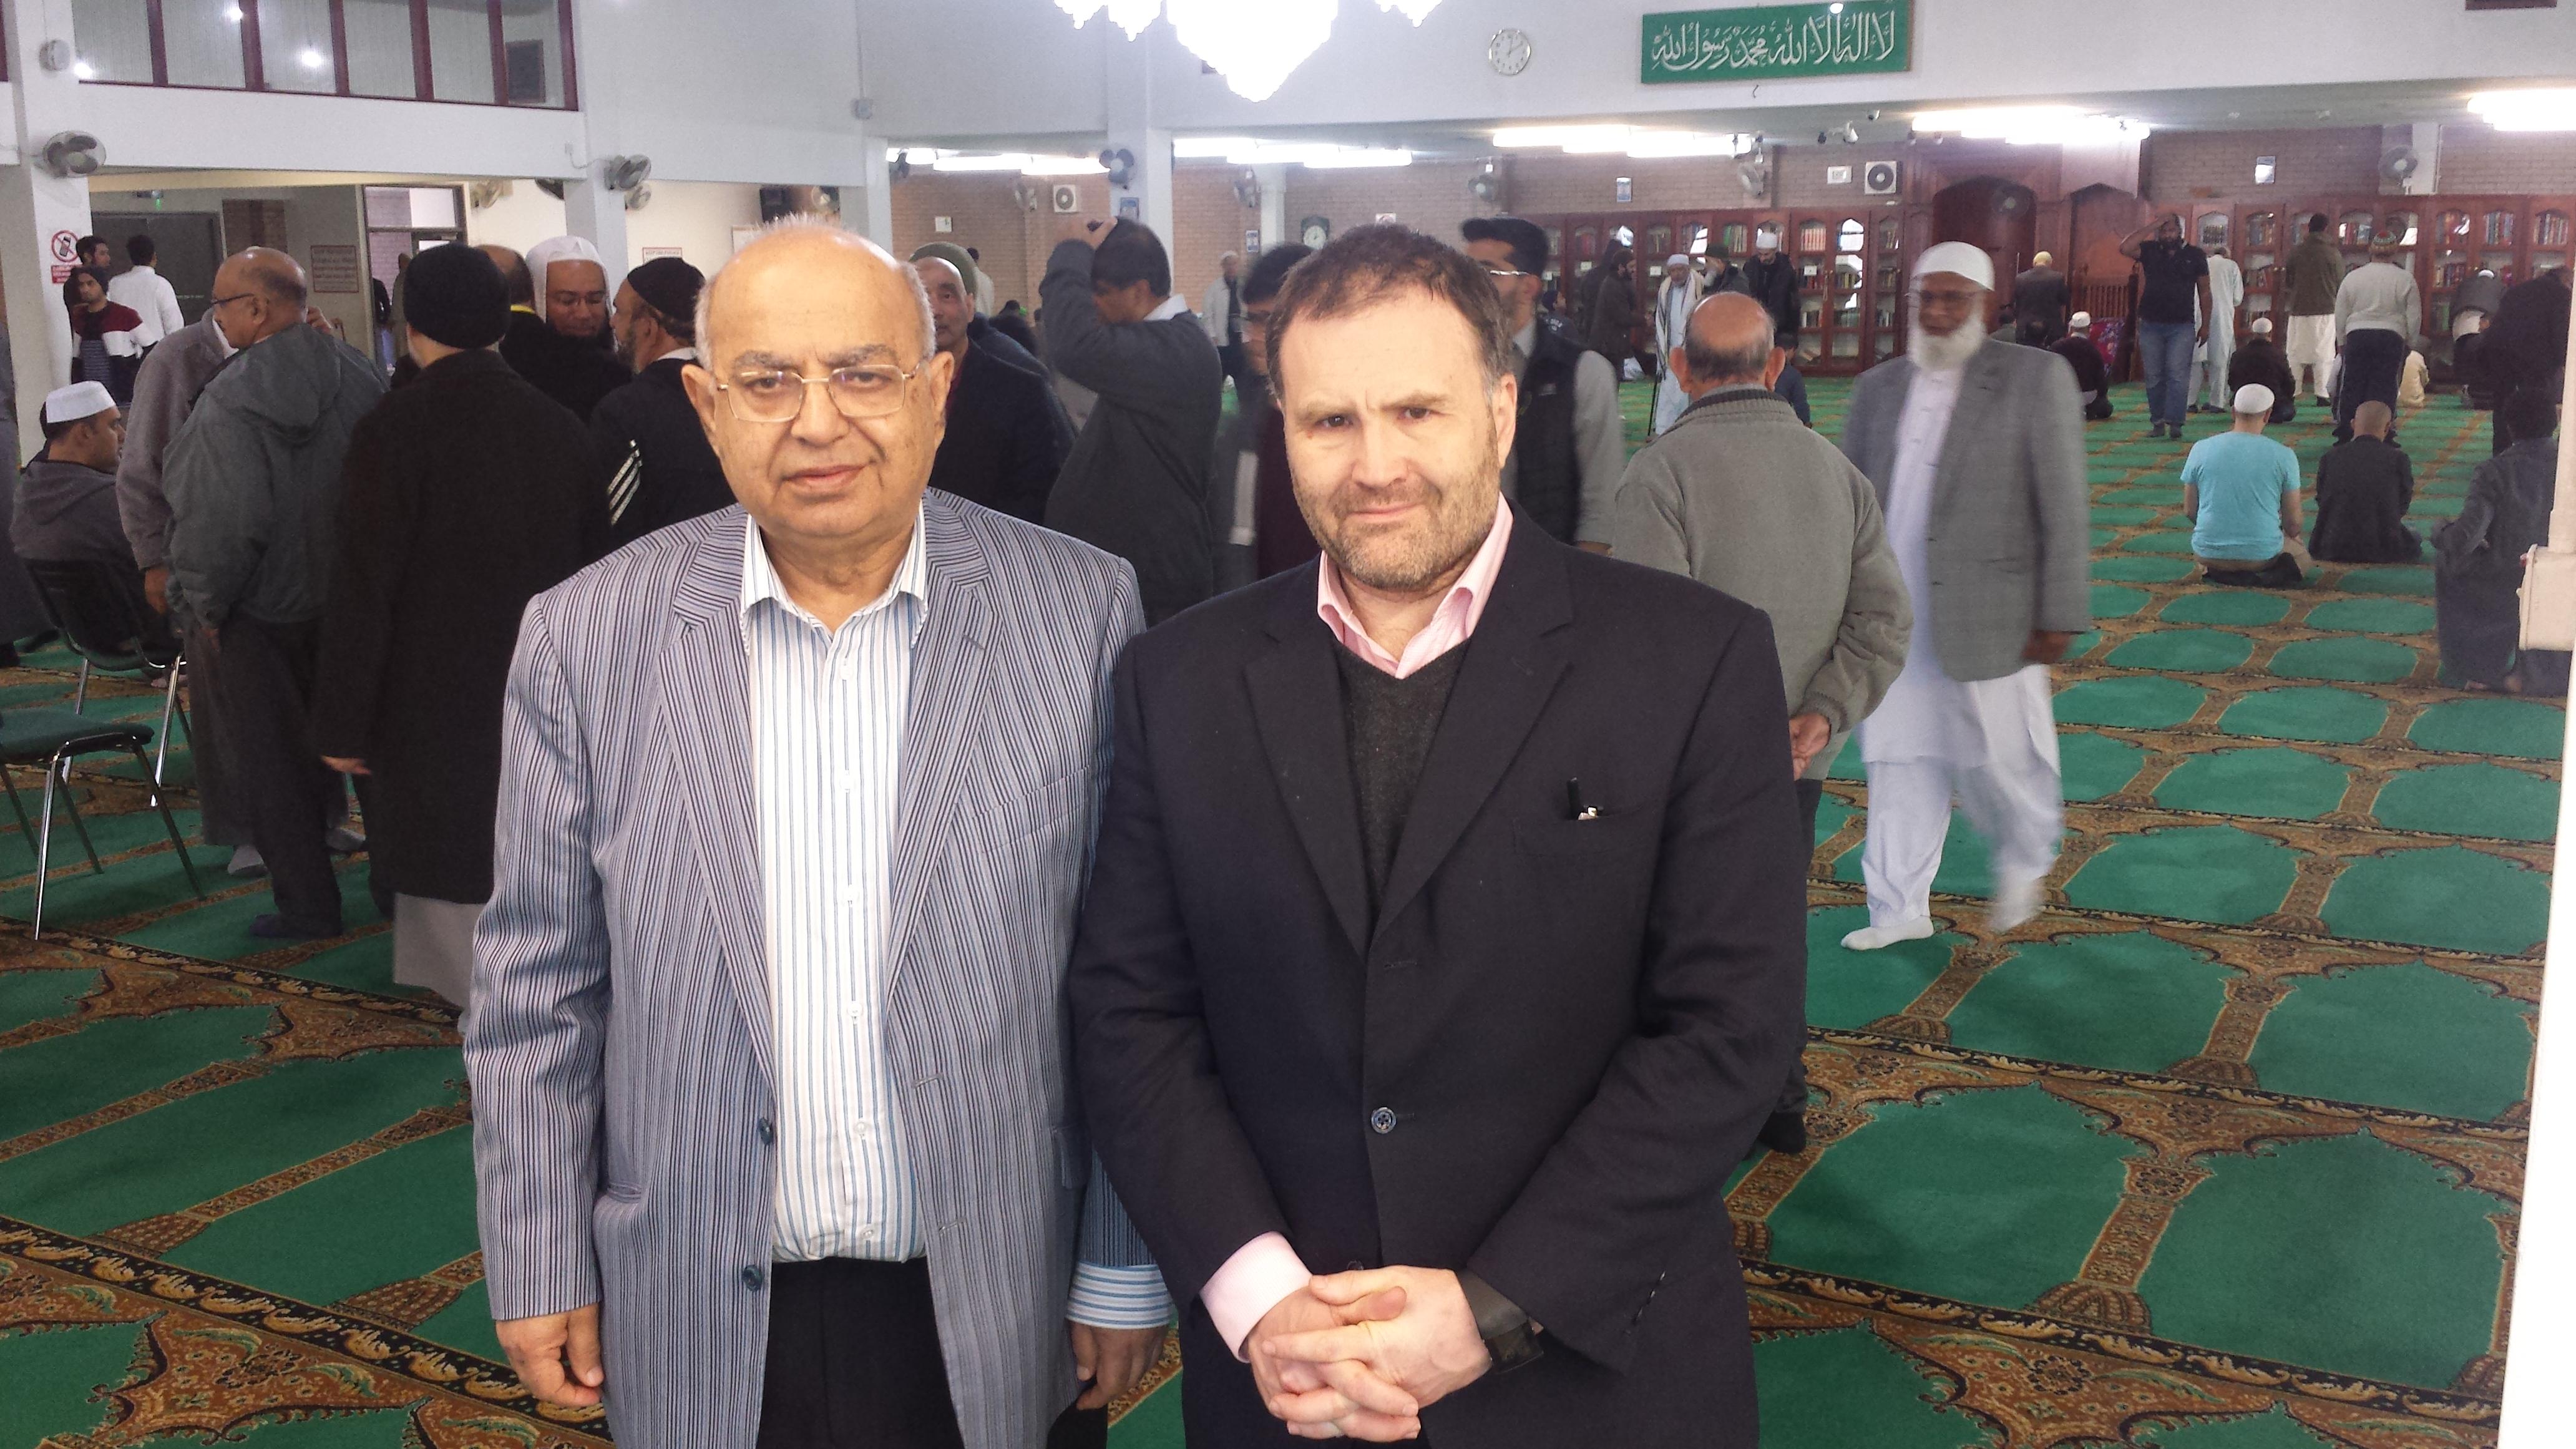 Birmingham Central Mosque Chairman Muhammad Afzal with West Midlands MEP Siôn Simon earlier today (Photograph: Adam Yosef)